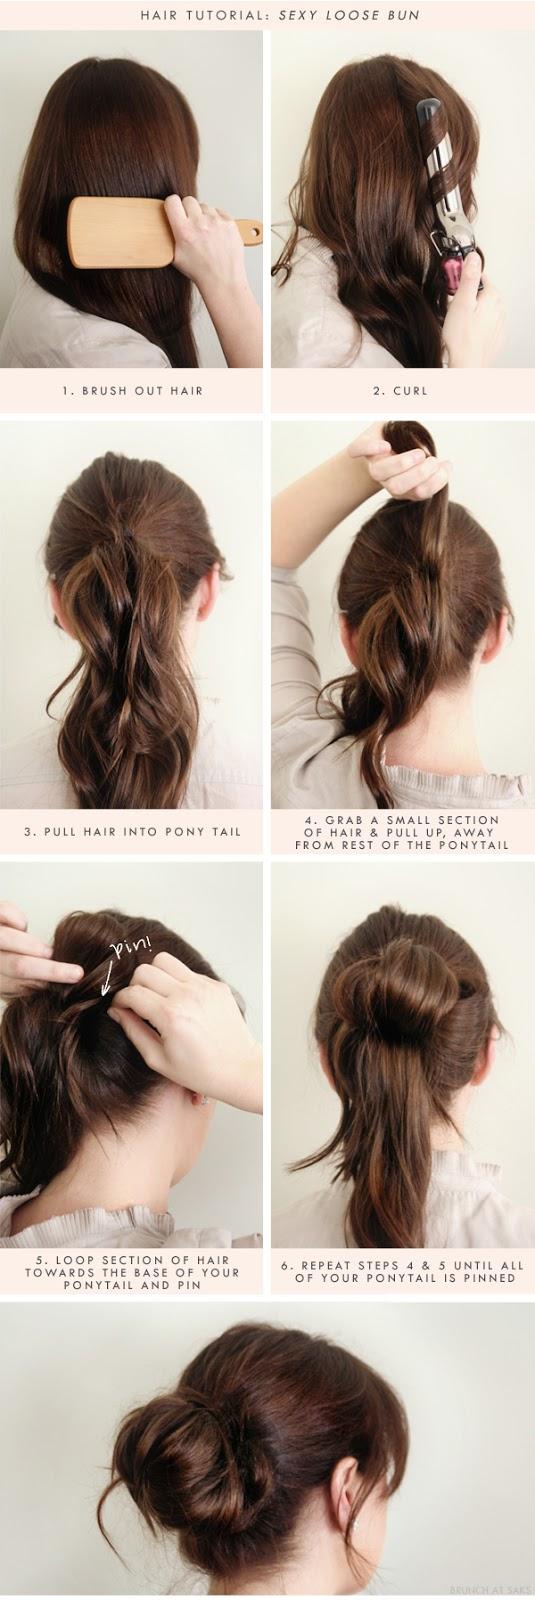 Fantastic Top 25 Messy Hair Bun Tutorials Perfect For Those Lazy Mornings Short Hairstyles For Black Women Fulllsitofus